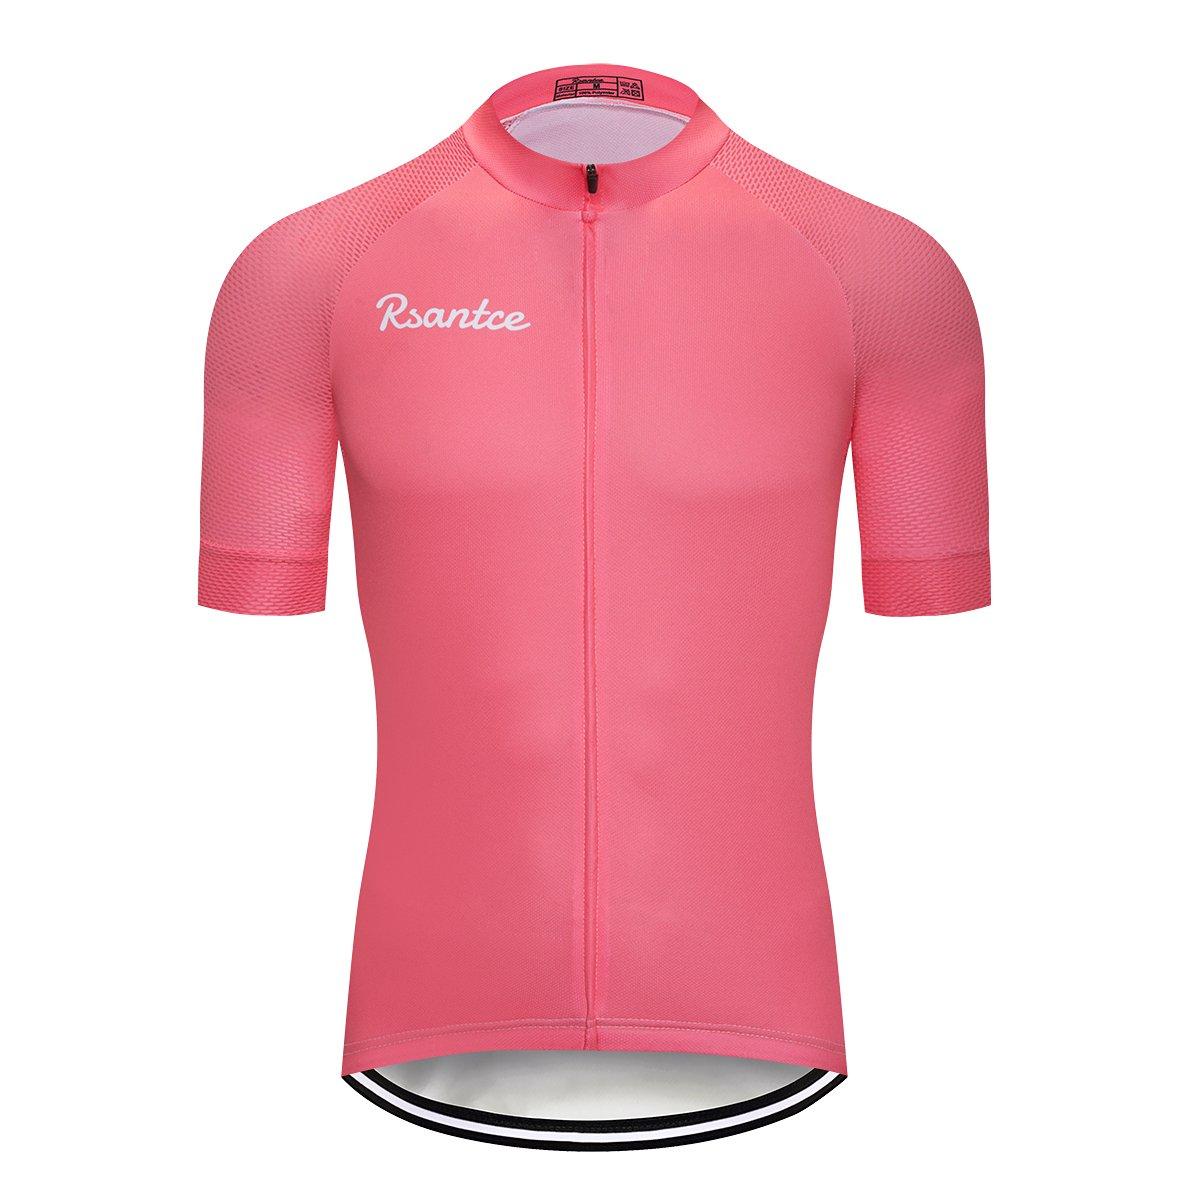 Rsantce SHIRT メンズ B07CVT4HQQ Medium|ピンク ピンク Medium